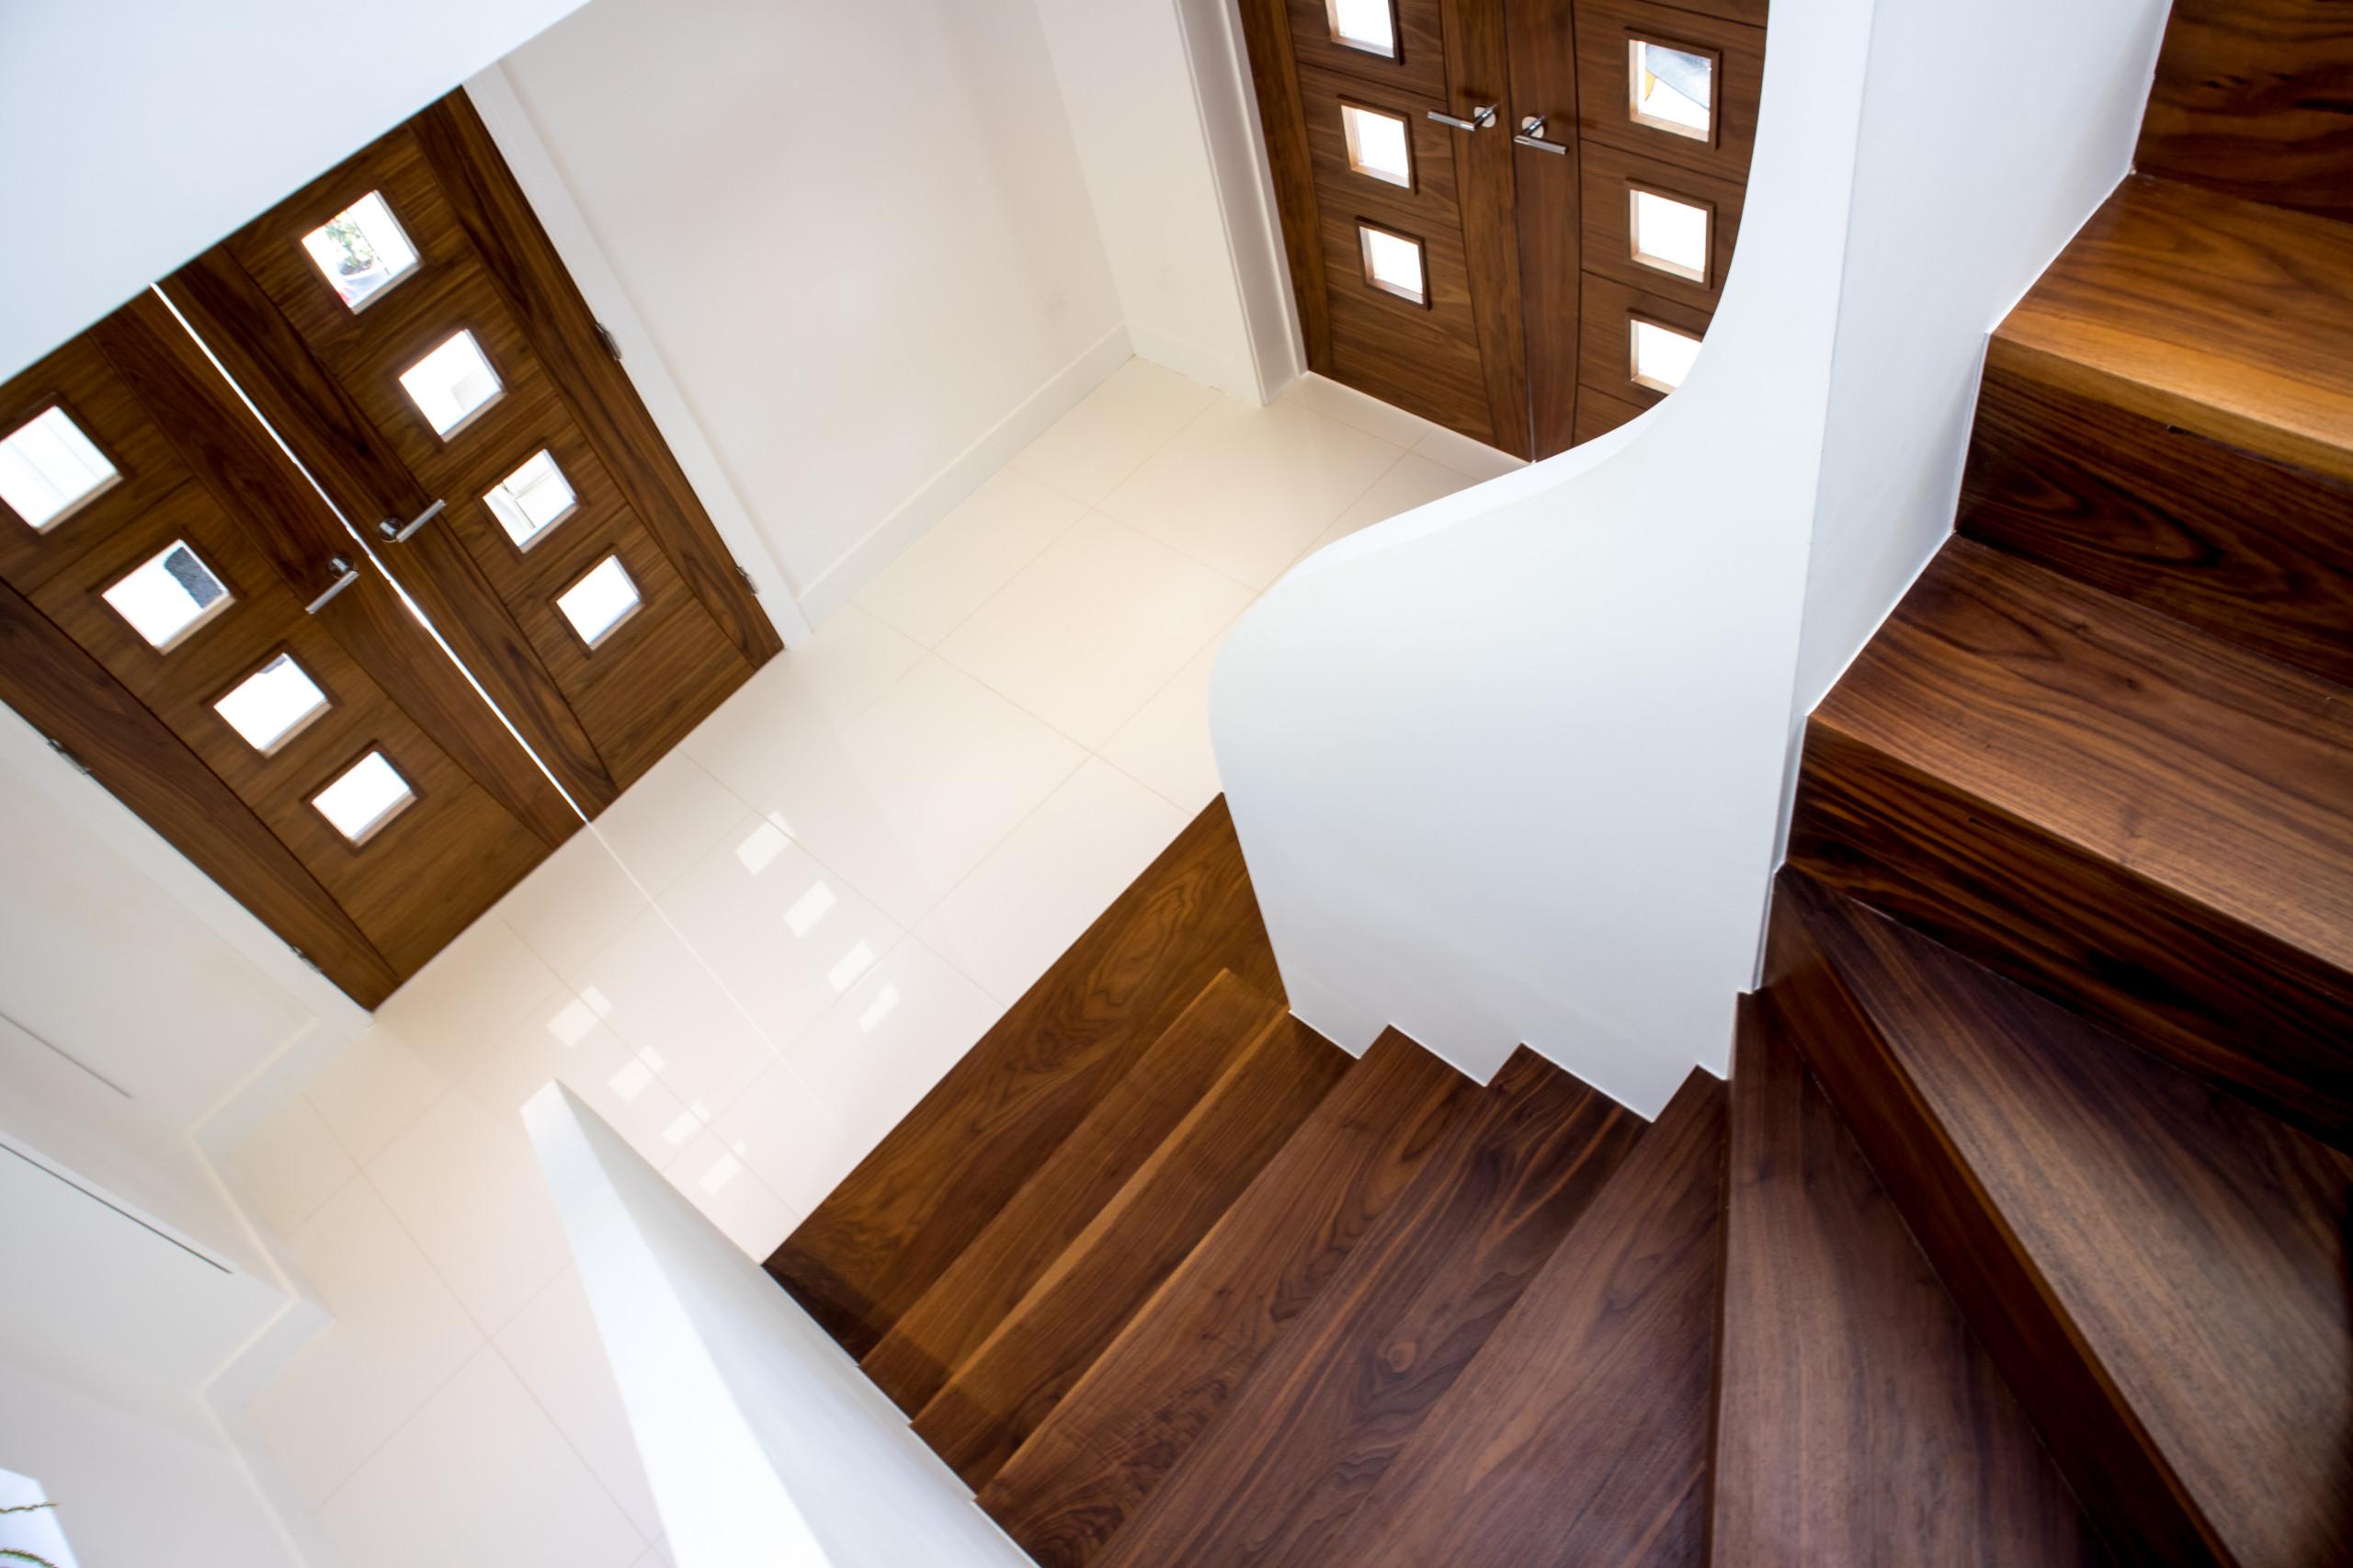 Walnut Staircase - Winders